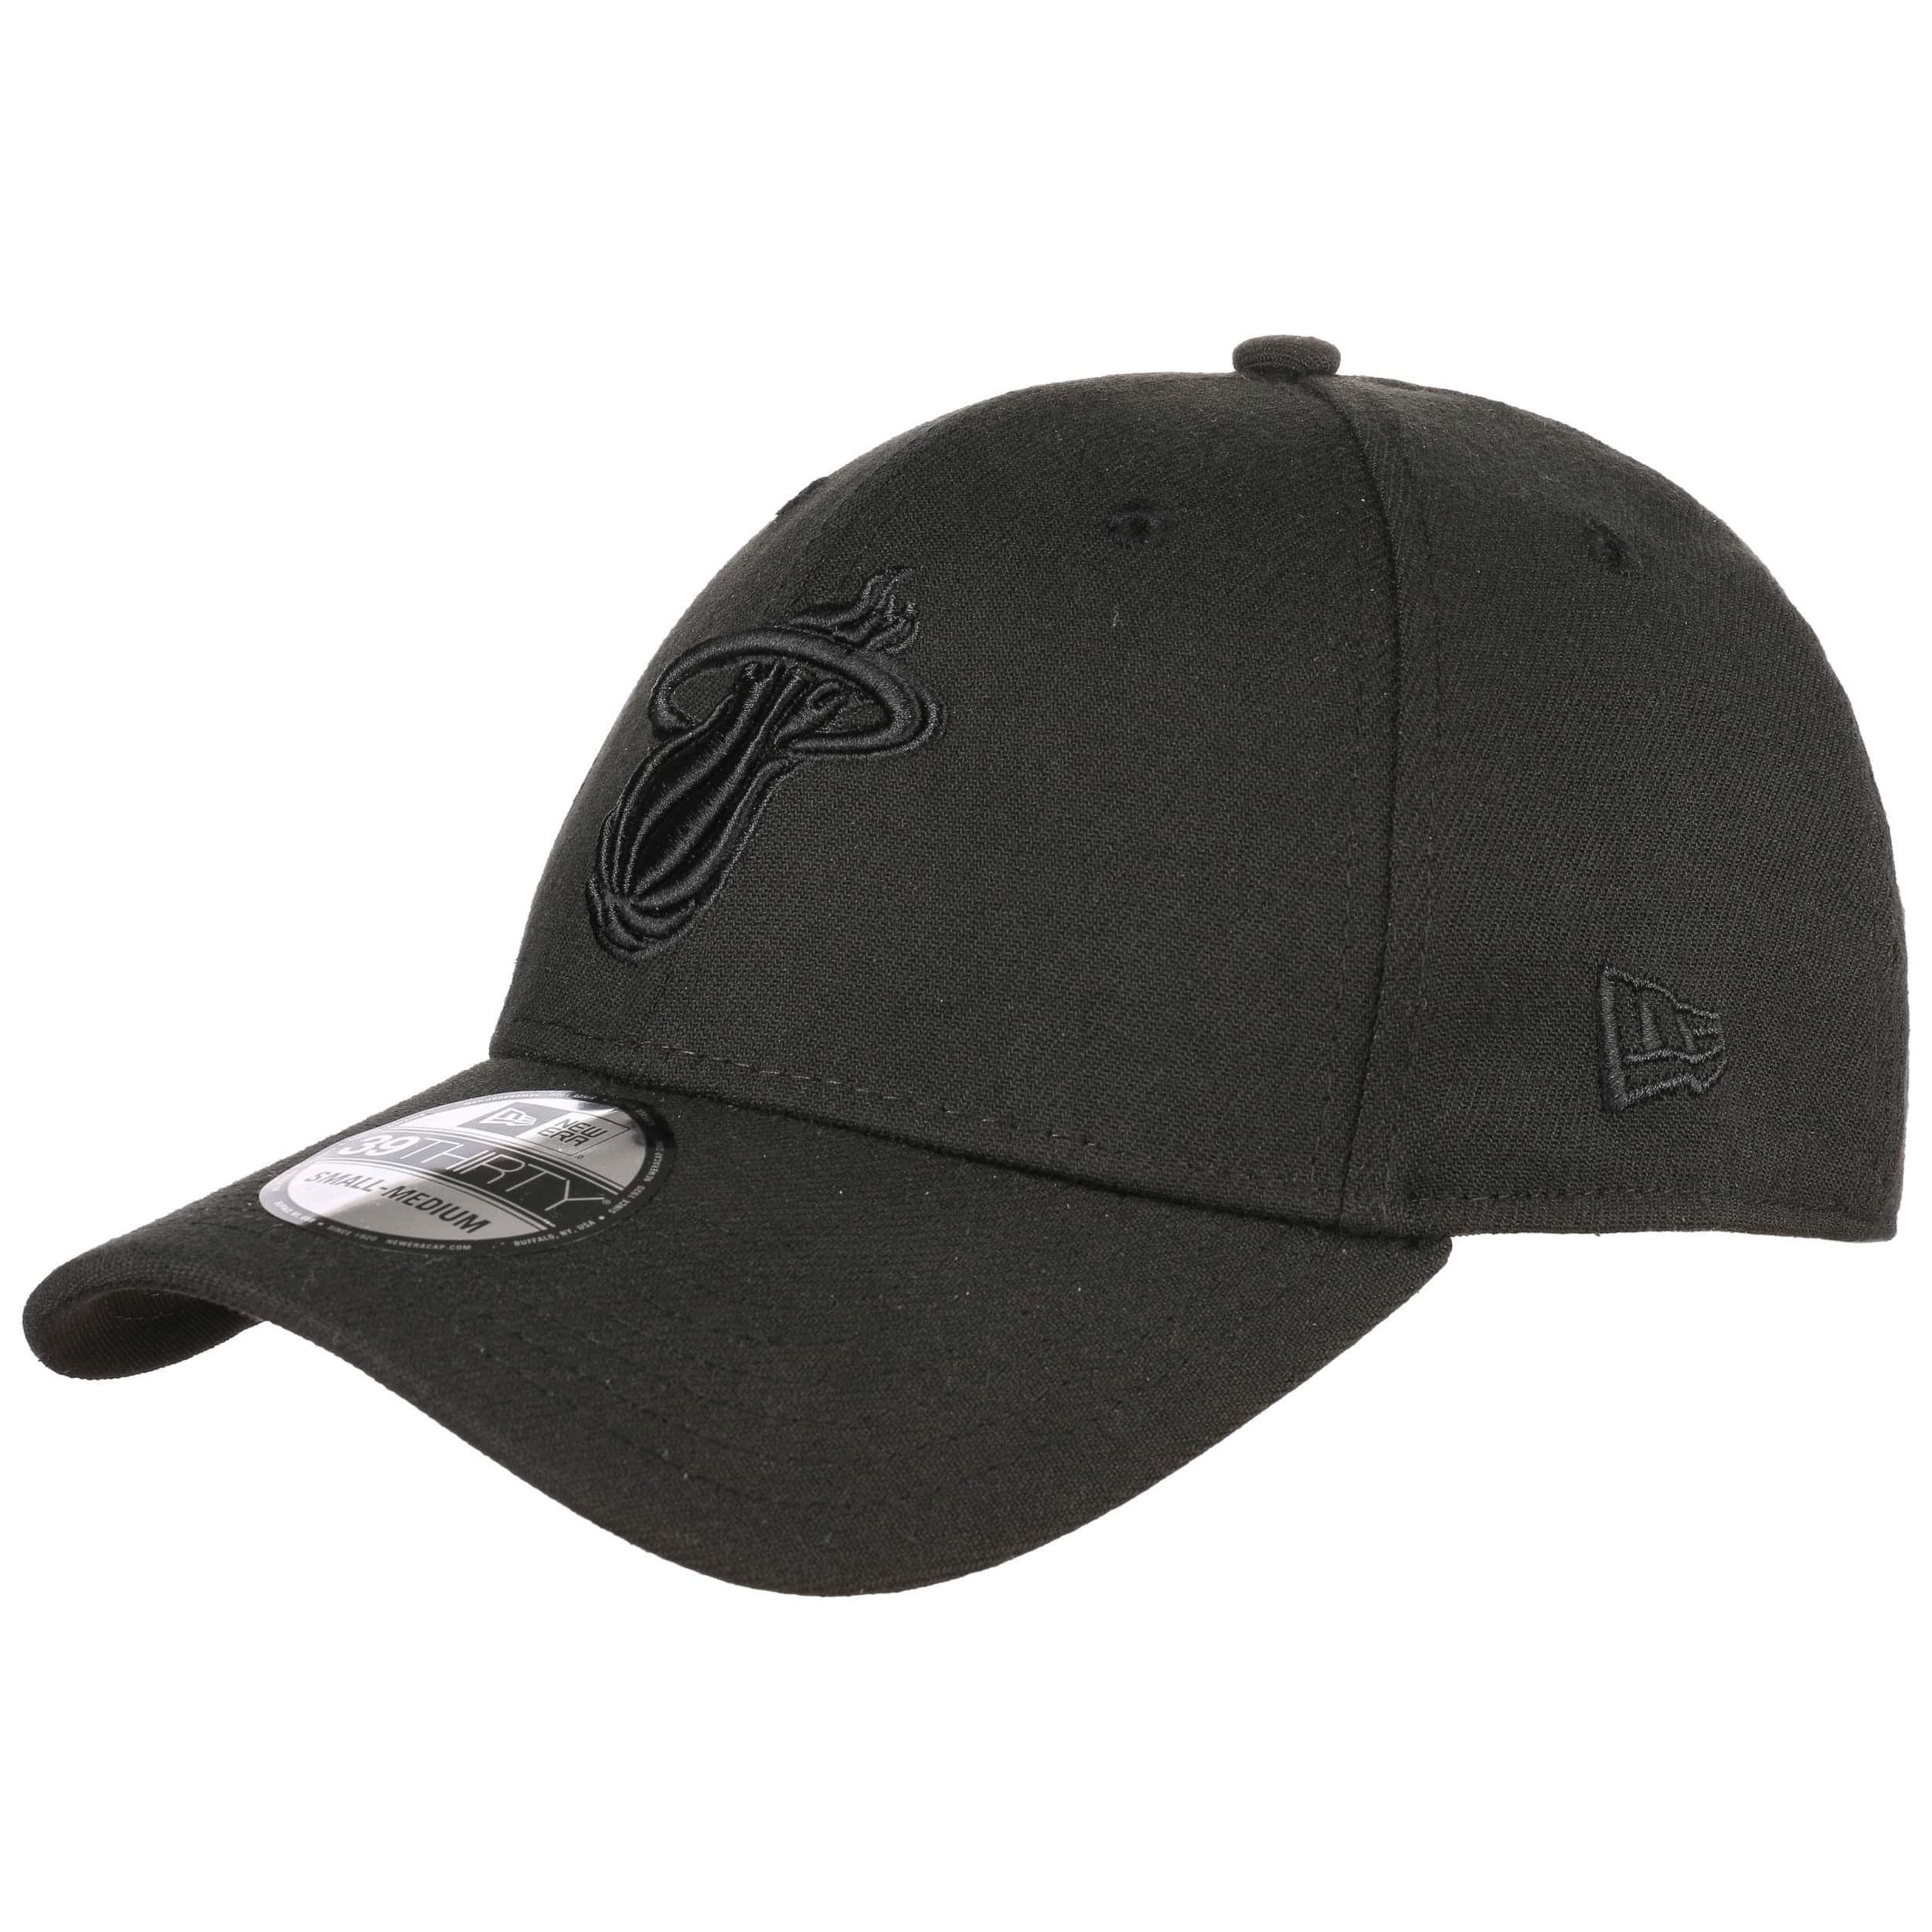 39thirty miami heat bob cap by new era eur 19 95 hats caps beanies shop online. Black Bedroom Furniture Sets. Home Design Ideas